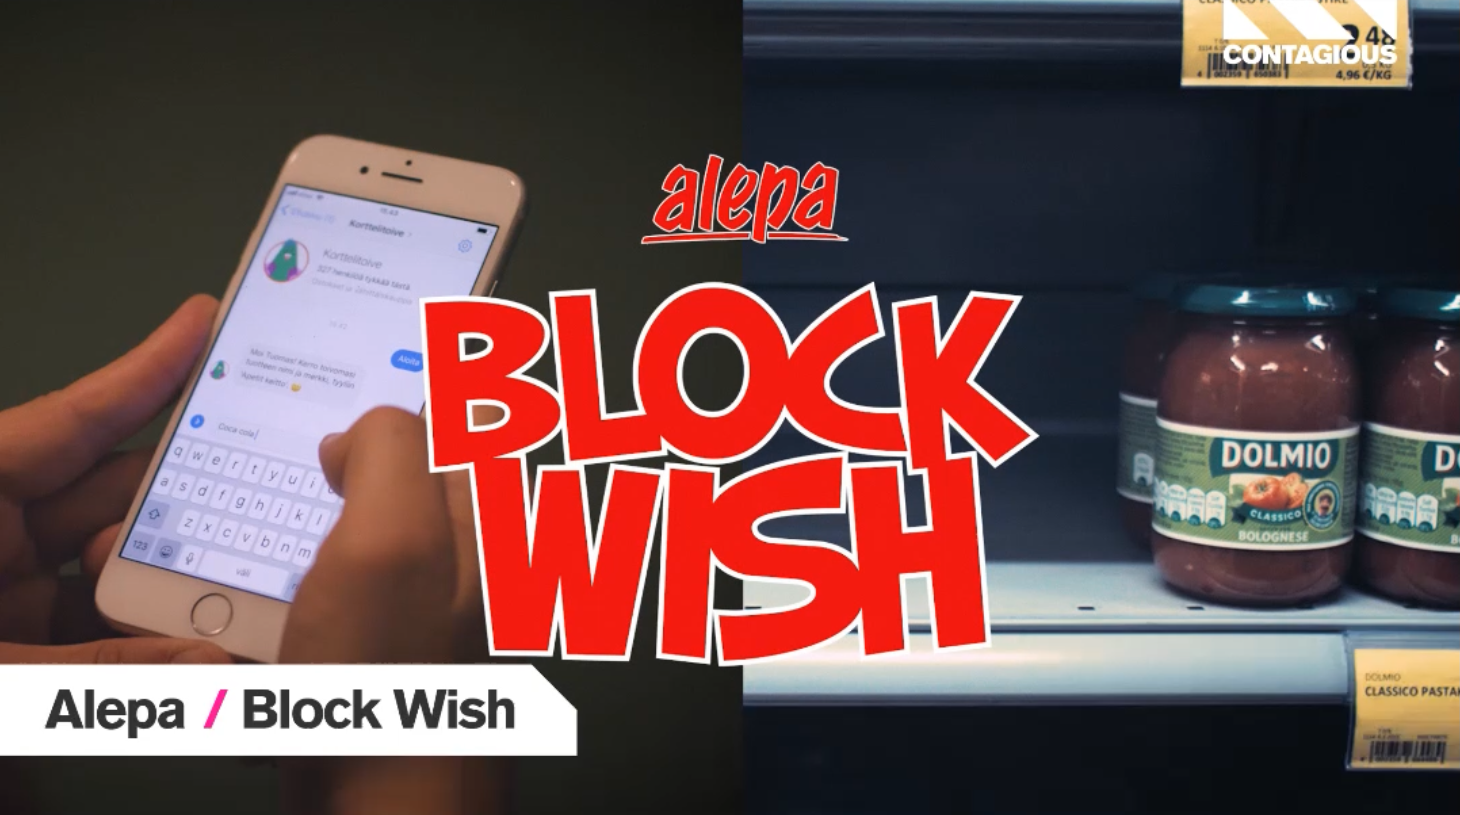 Audiense blog - Alepa | Block Wish | TBWA and SOK